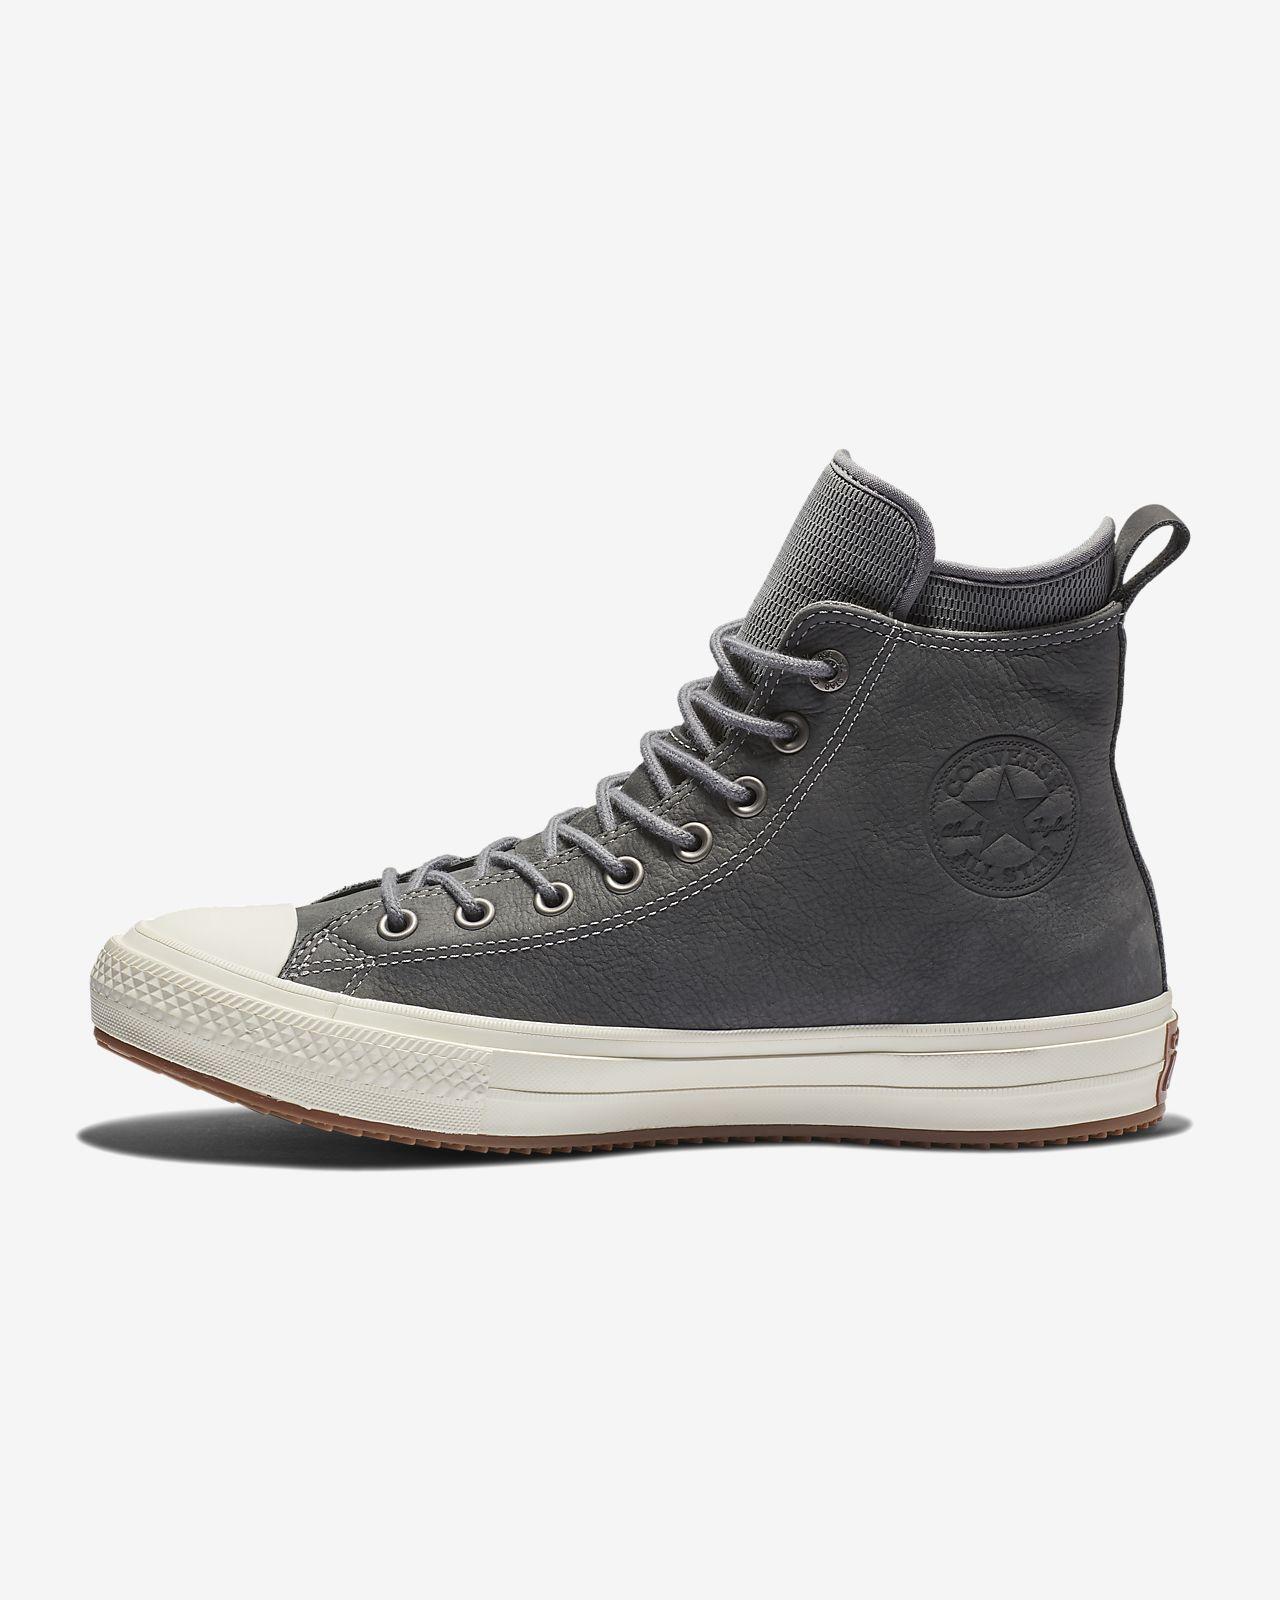 fe4e0a0a7dd80 ... australia converse chuck taylor all star waterproof nubuck boot unisex  leather boot f173f a3c00